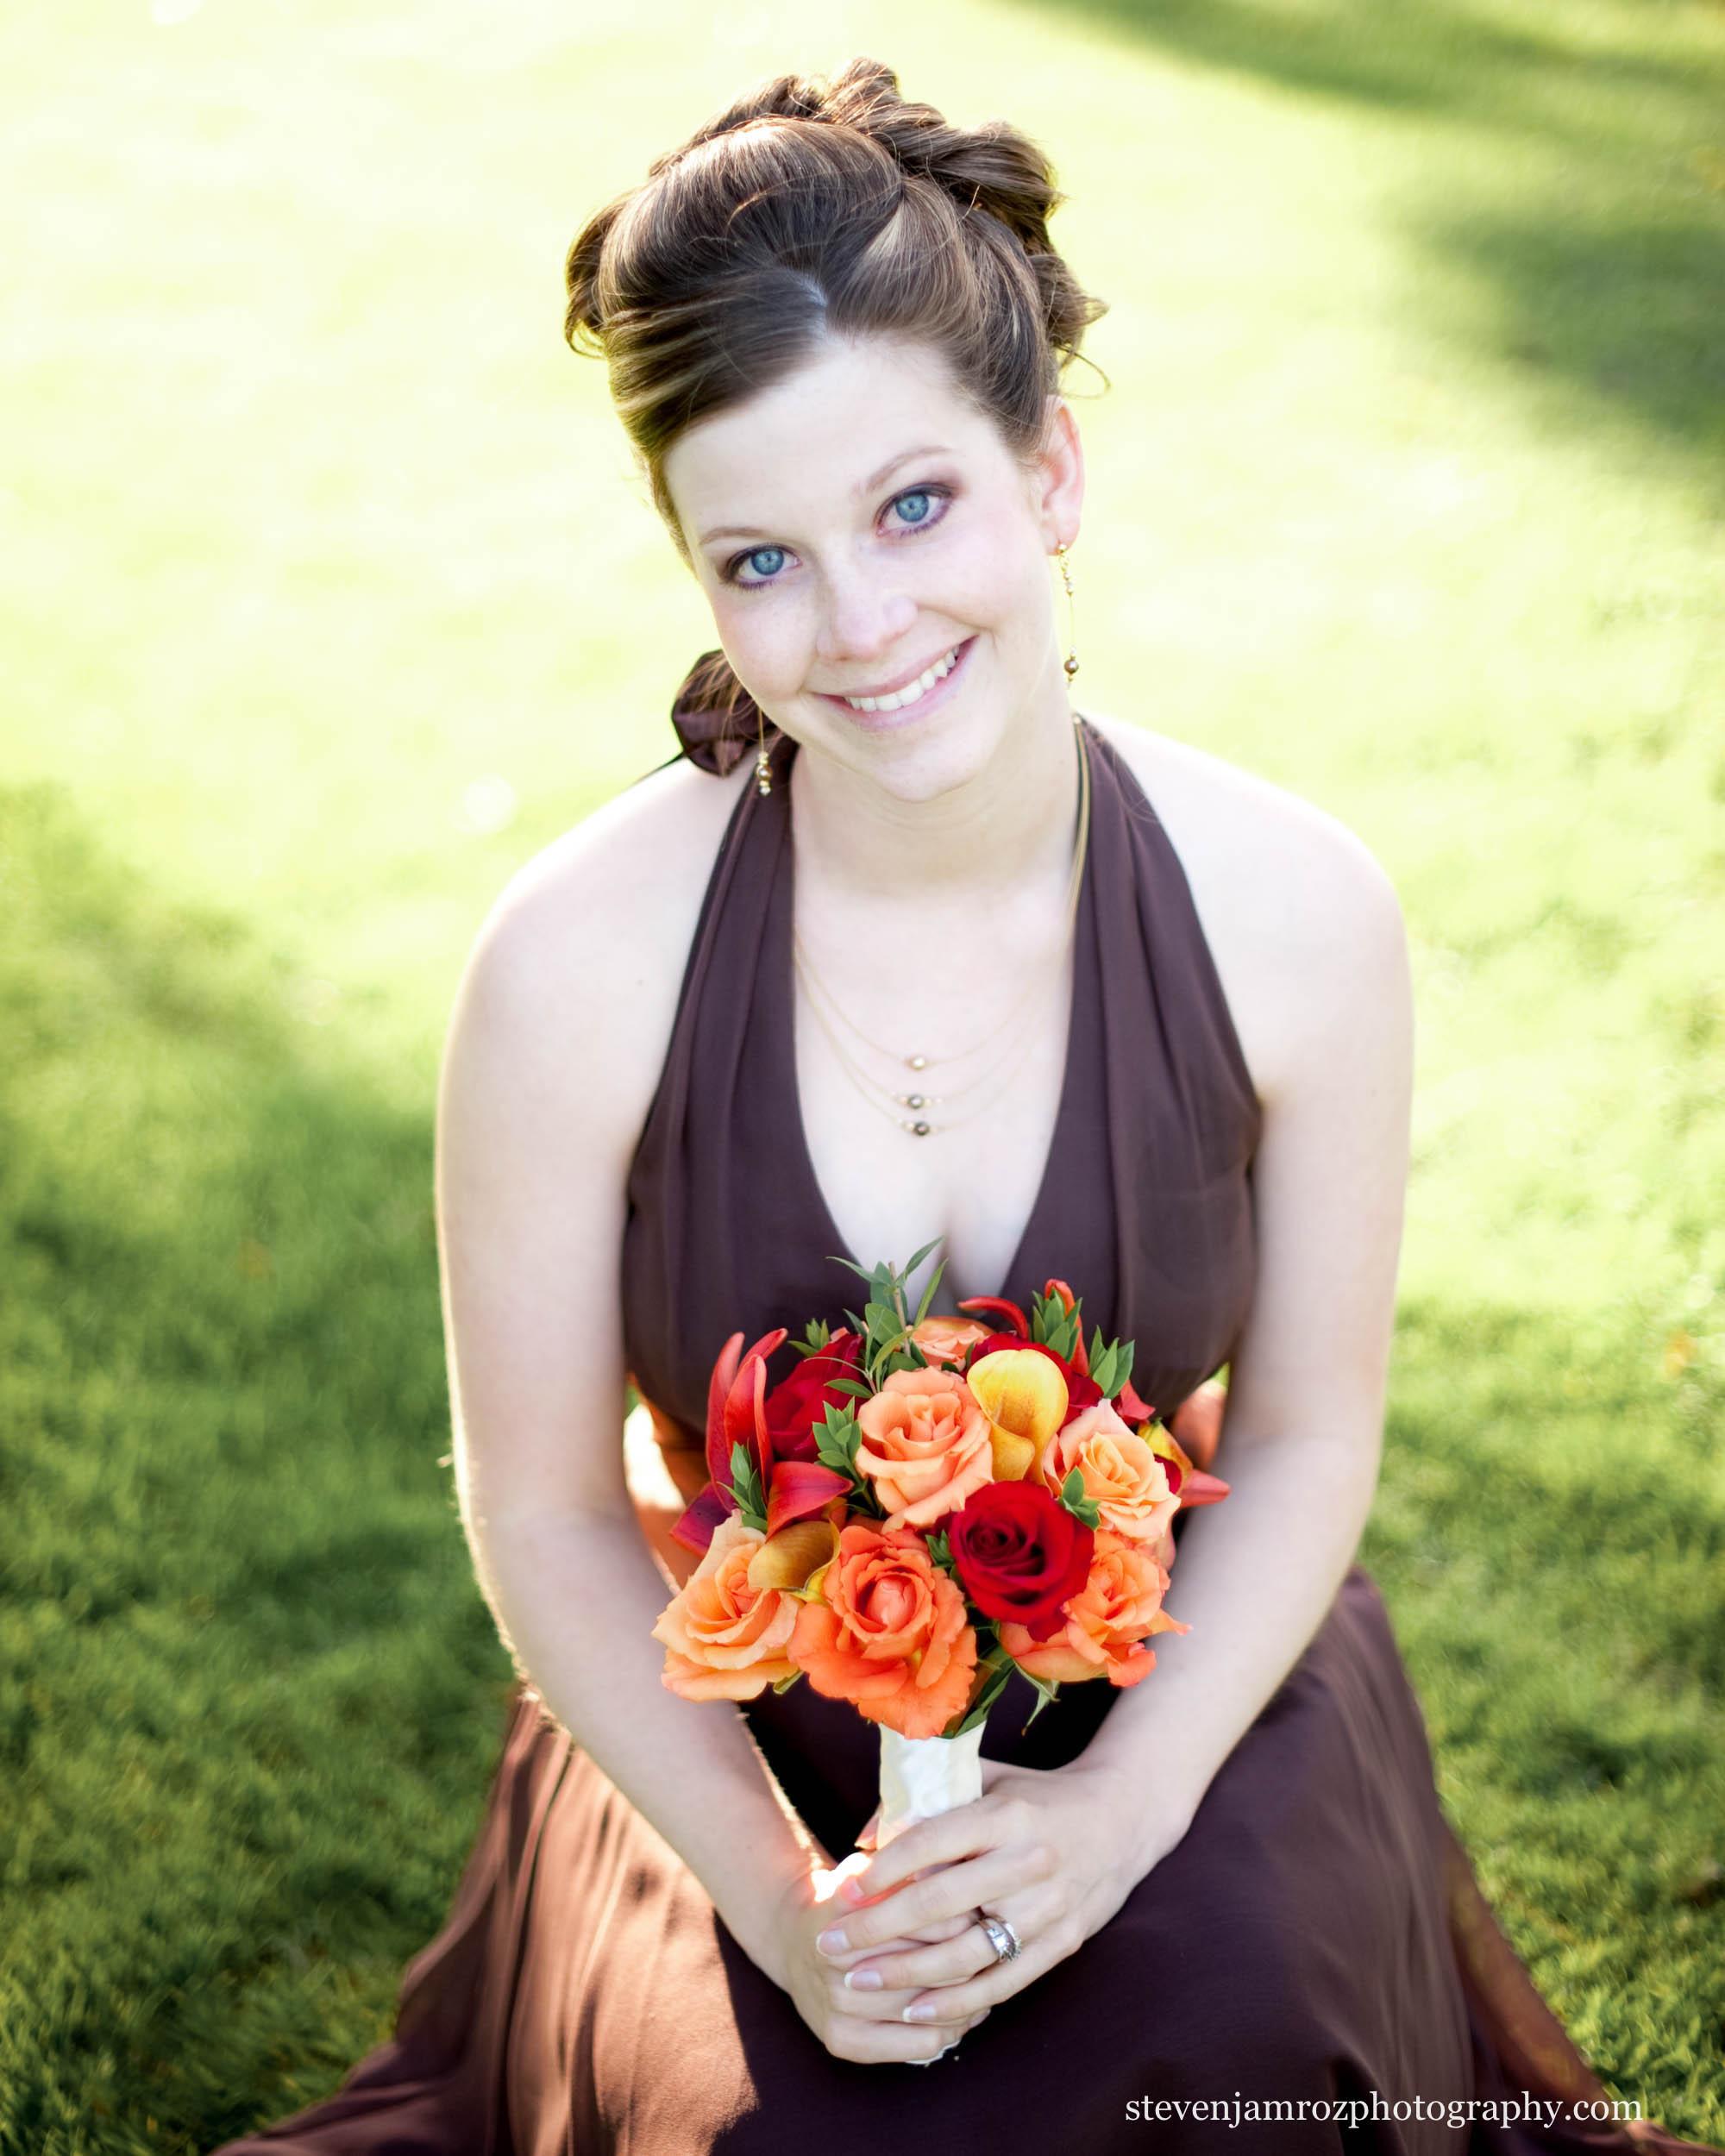 beautiful-wedding-portraits-photographer-steven-jamroz-0678.jpg